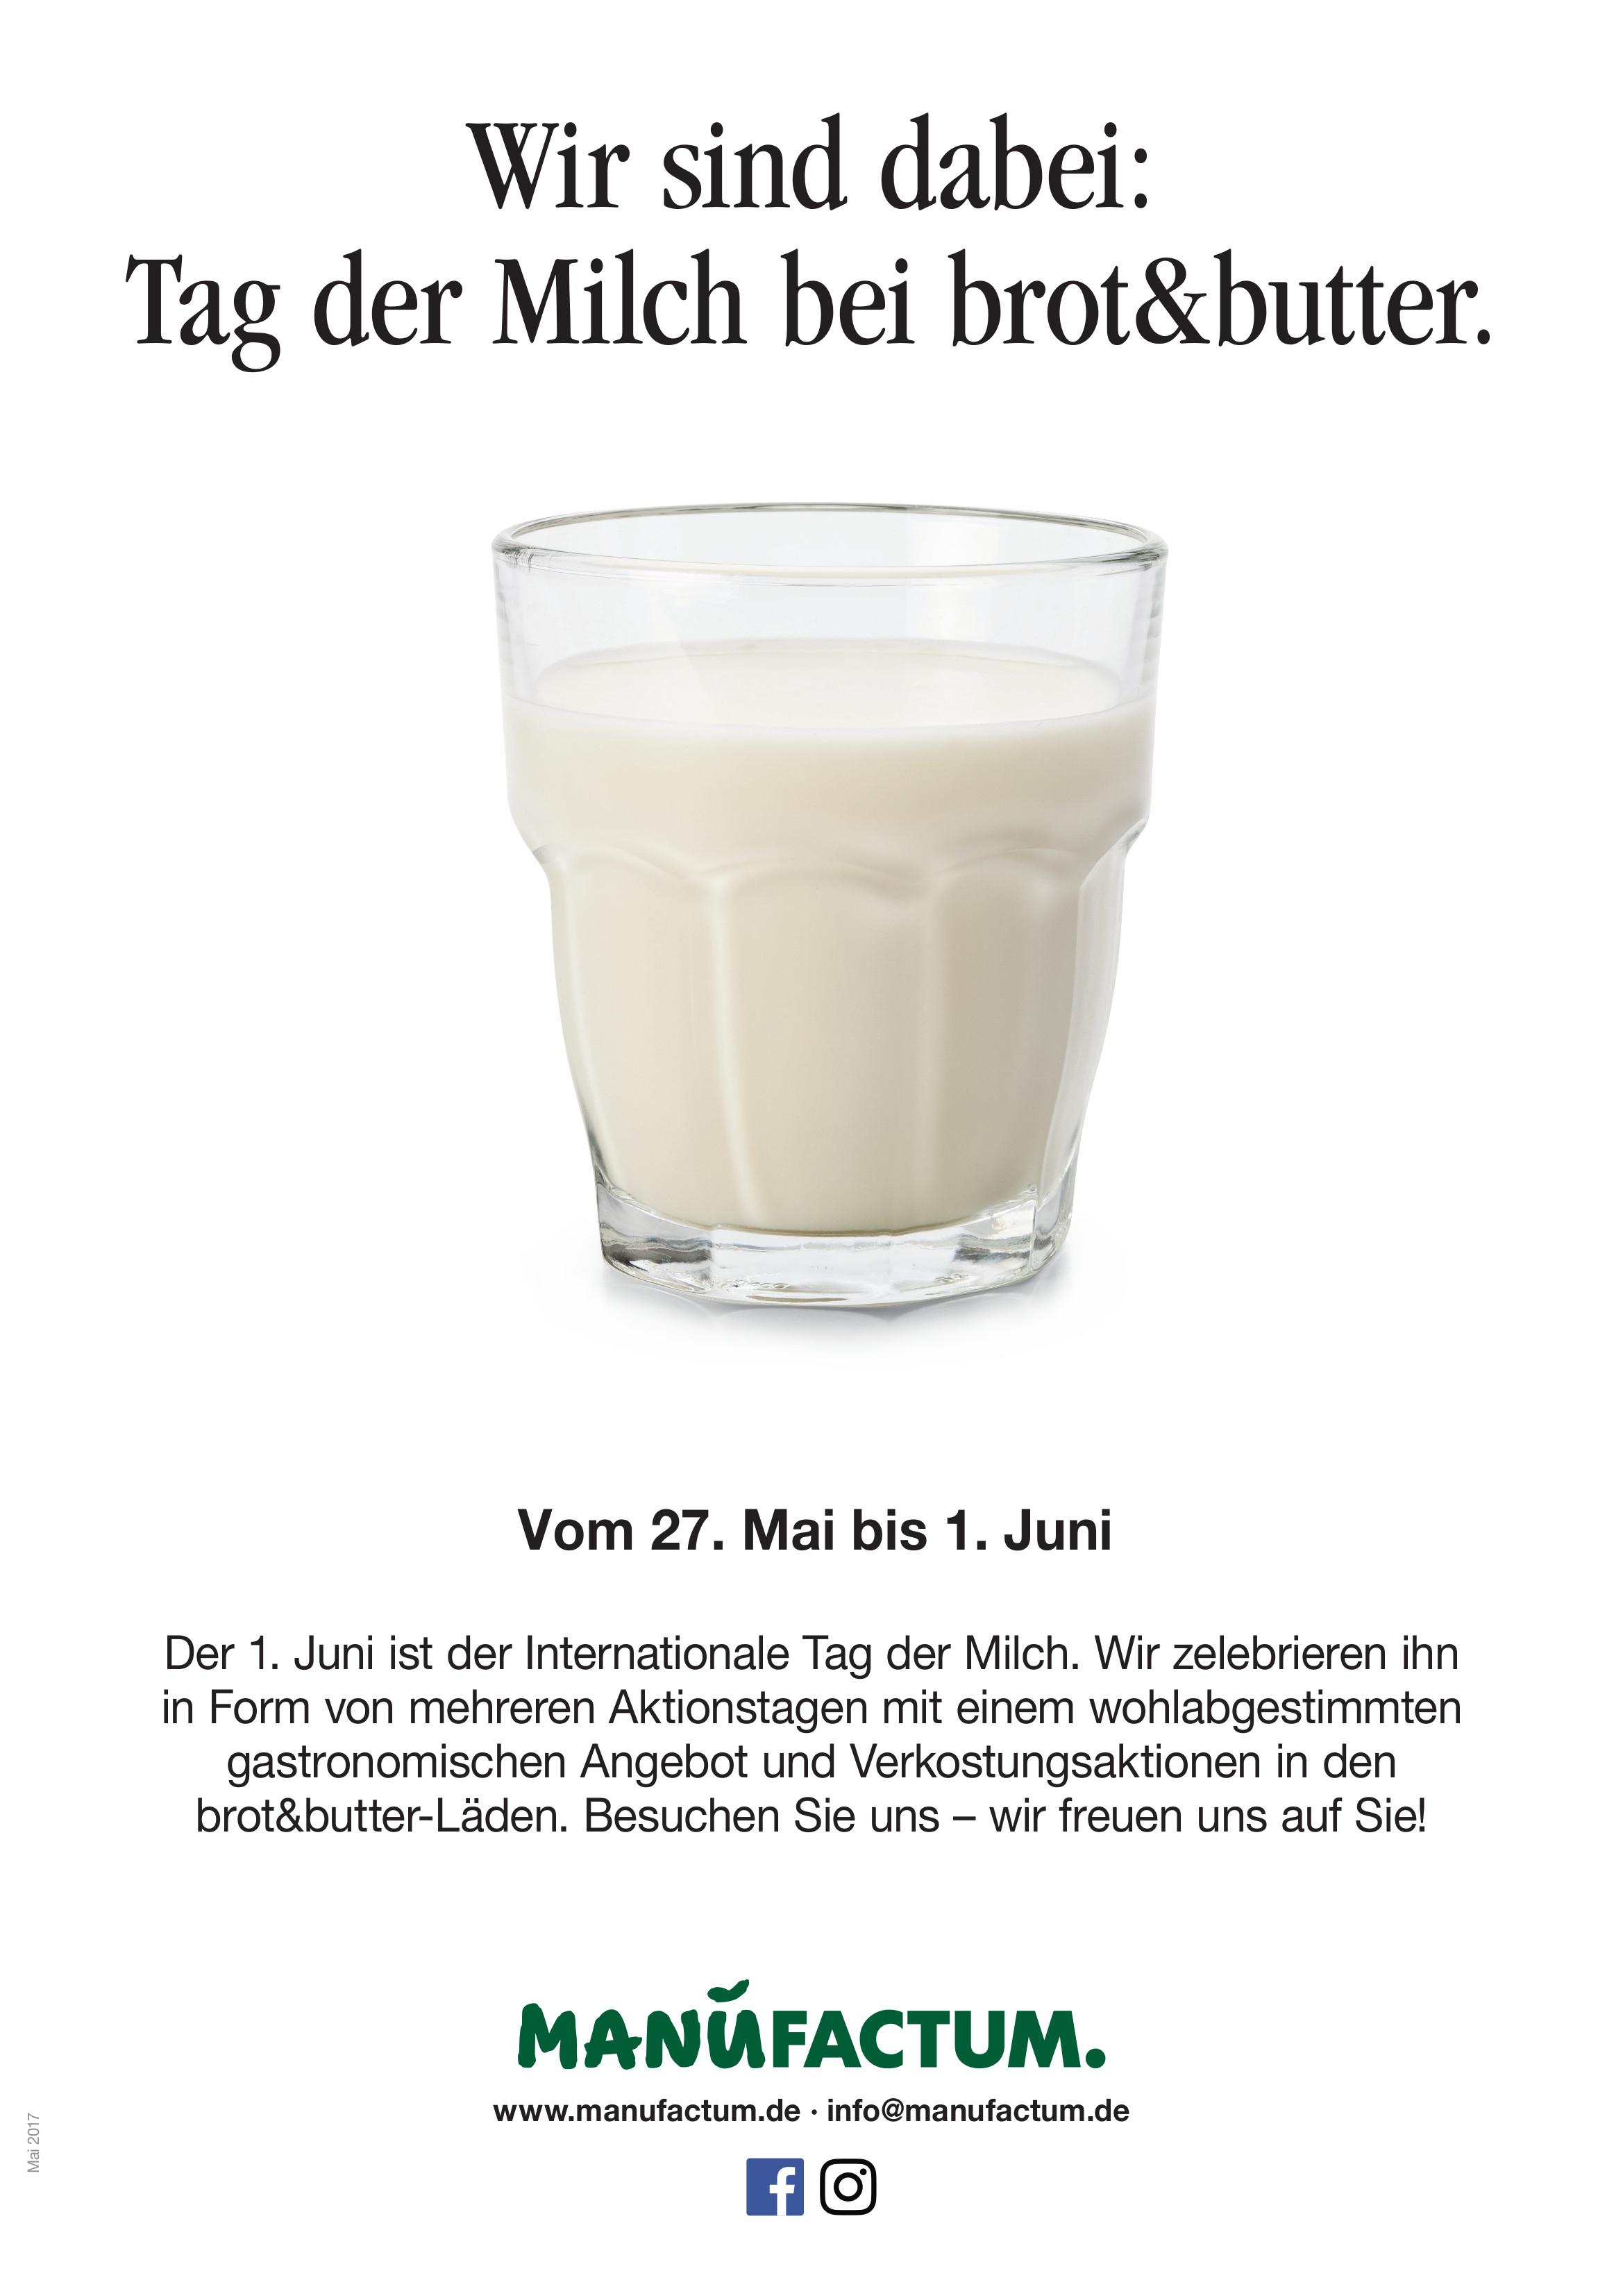 b&b_Tag der Milch Plakat_2017